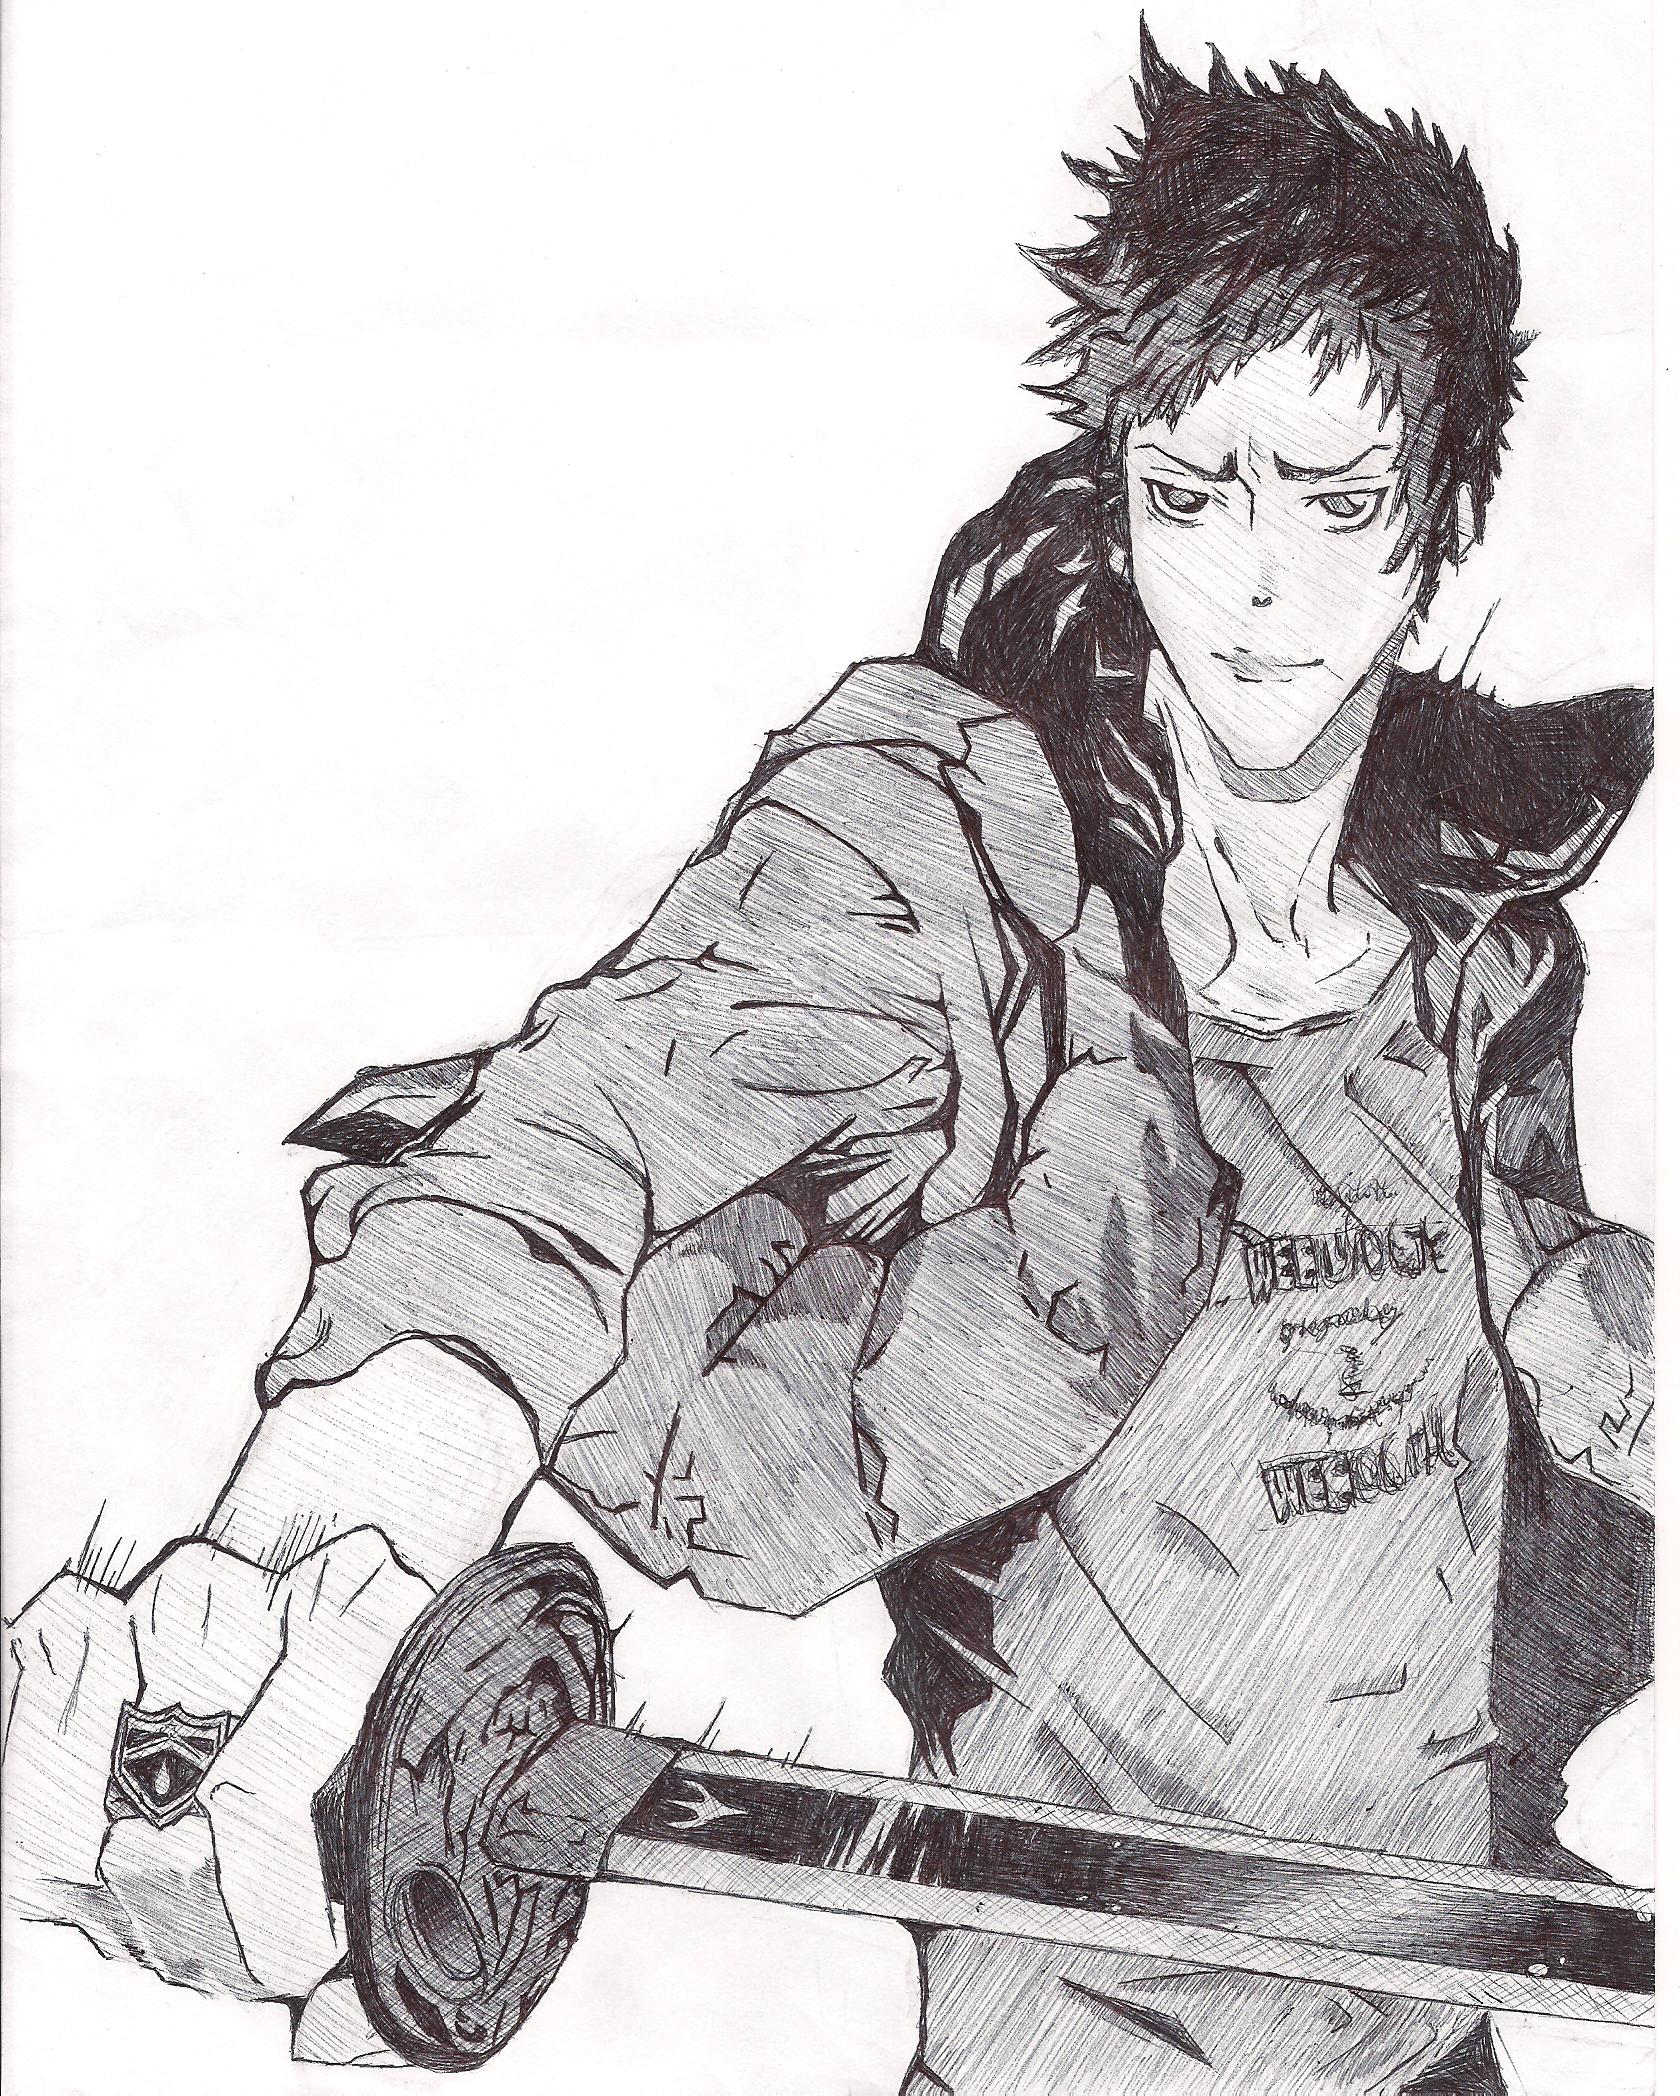 Hitman Reborn- Yamamoto by Niyazi93 on DeviantArt